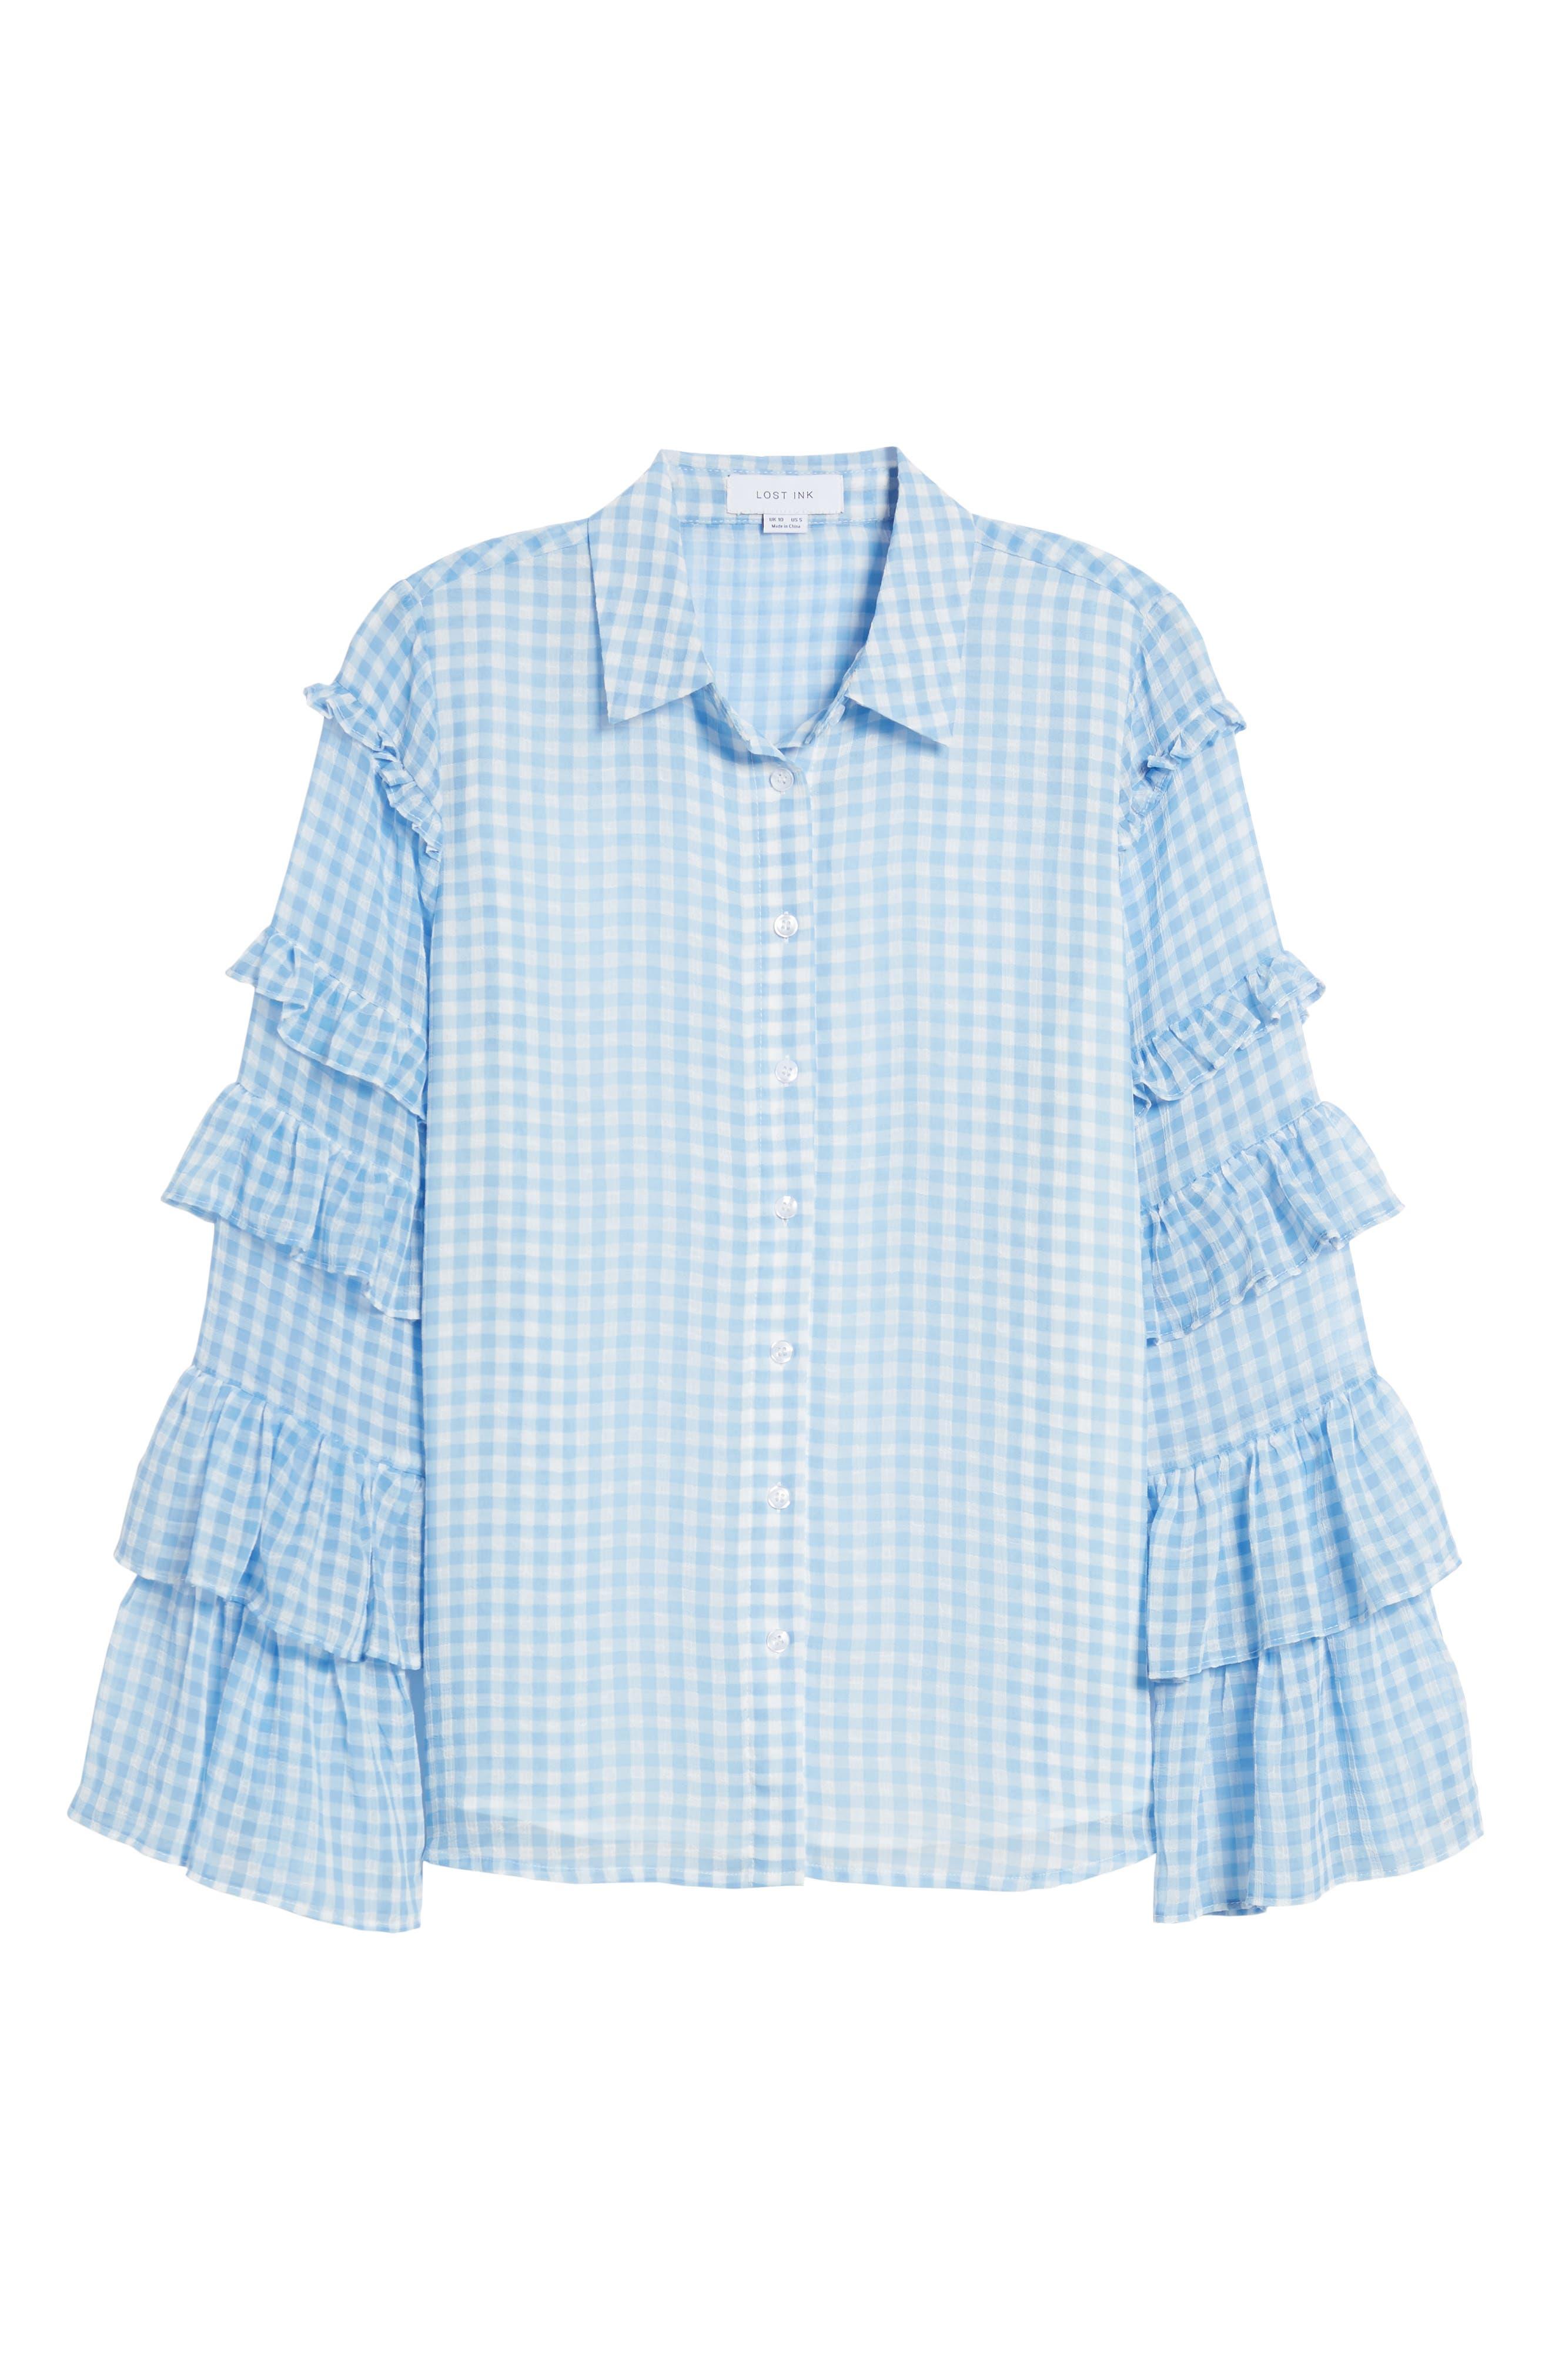 Ruffle Sleeve Shirt,                             Alternate thumbnail 7, color,                             400